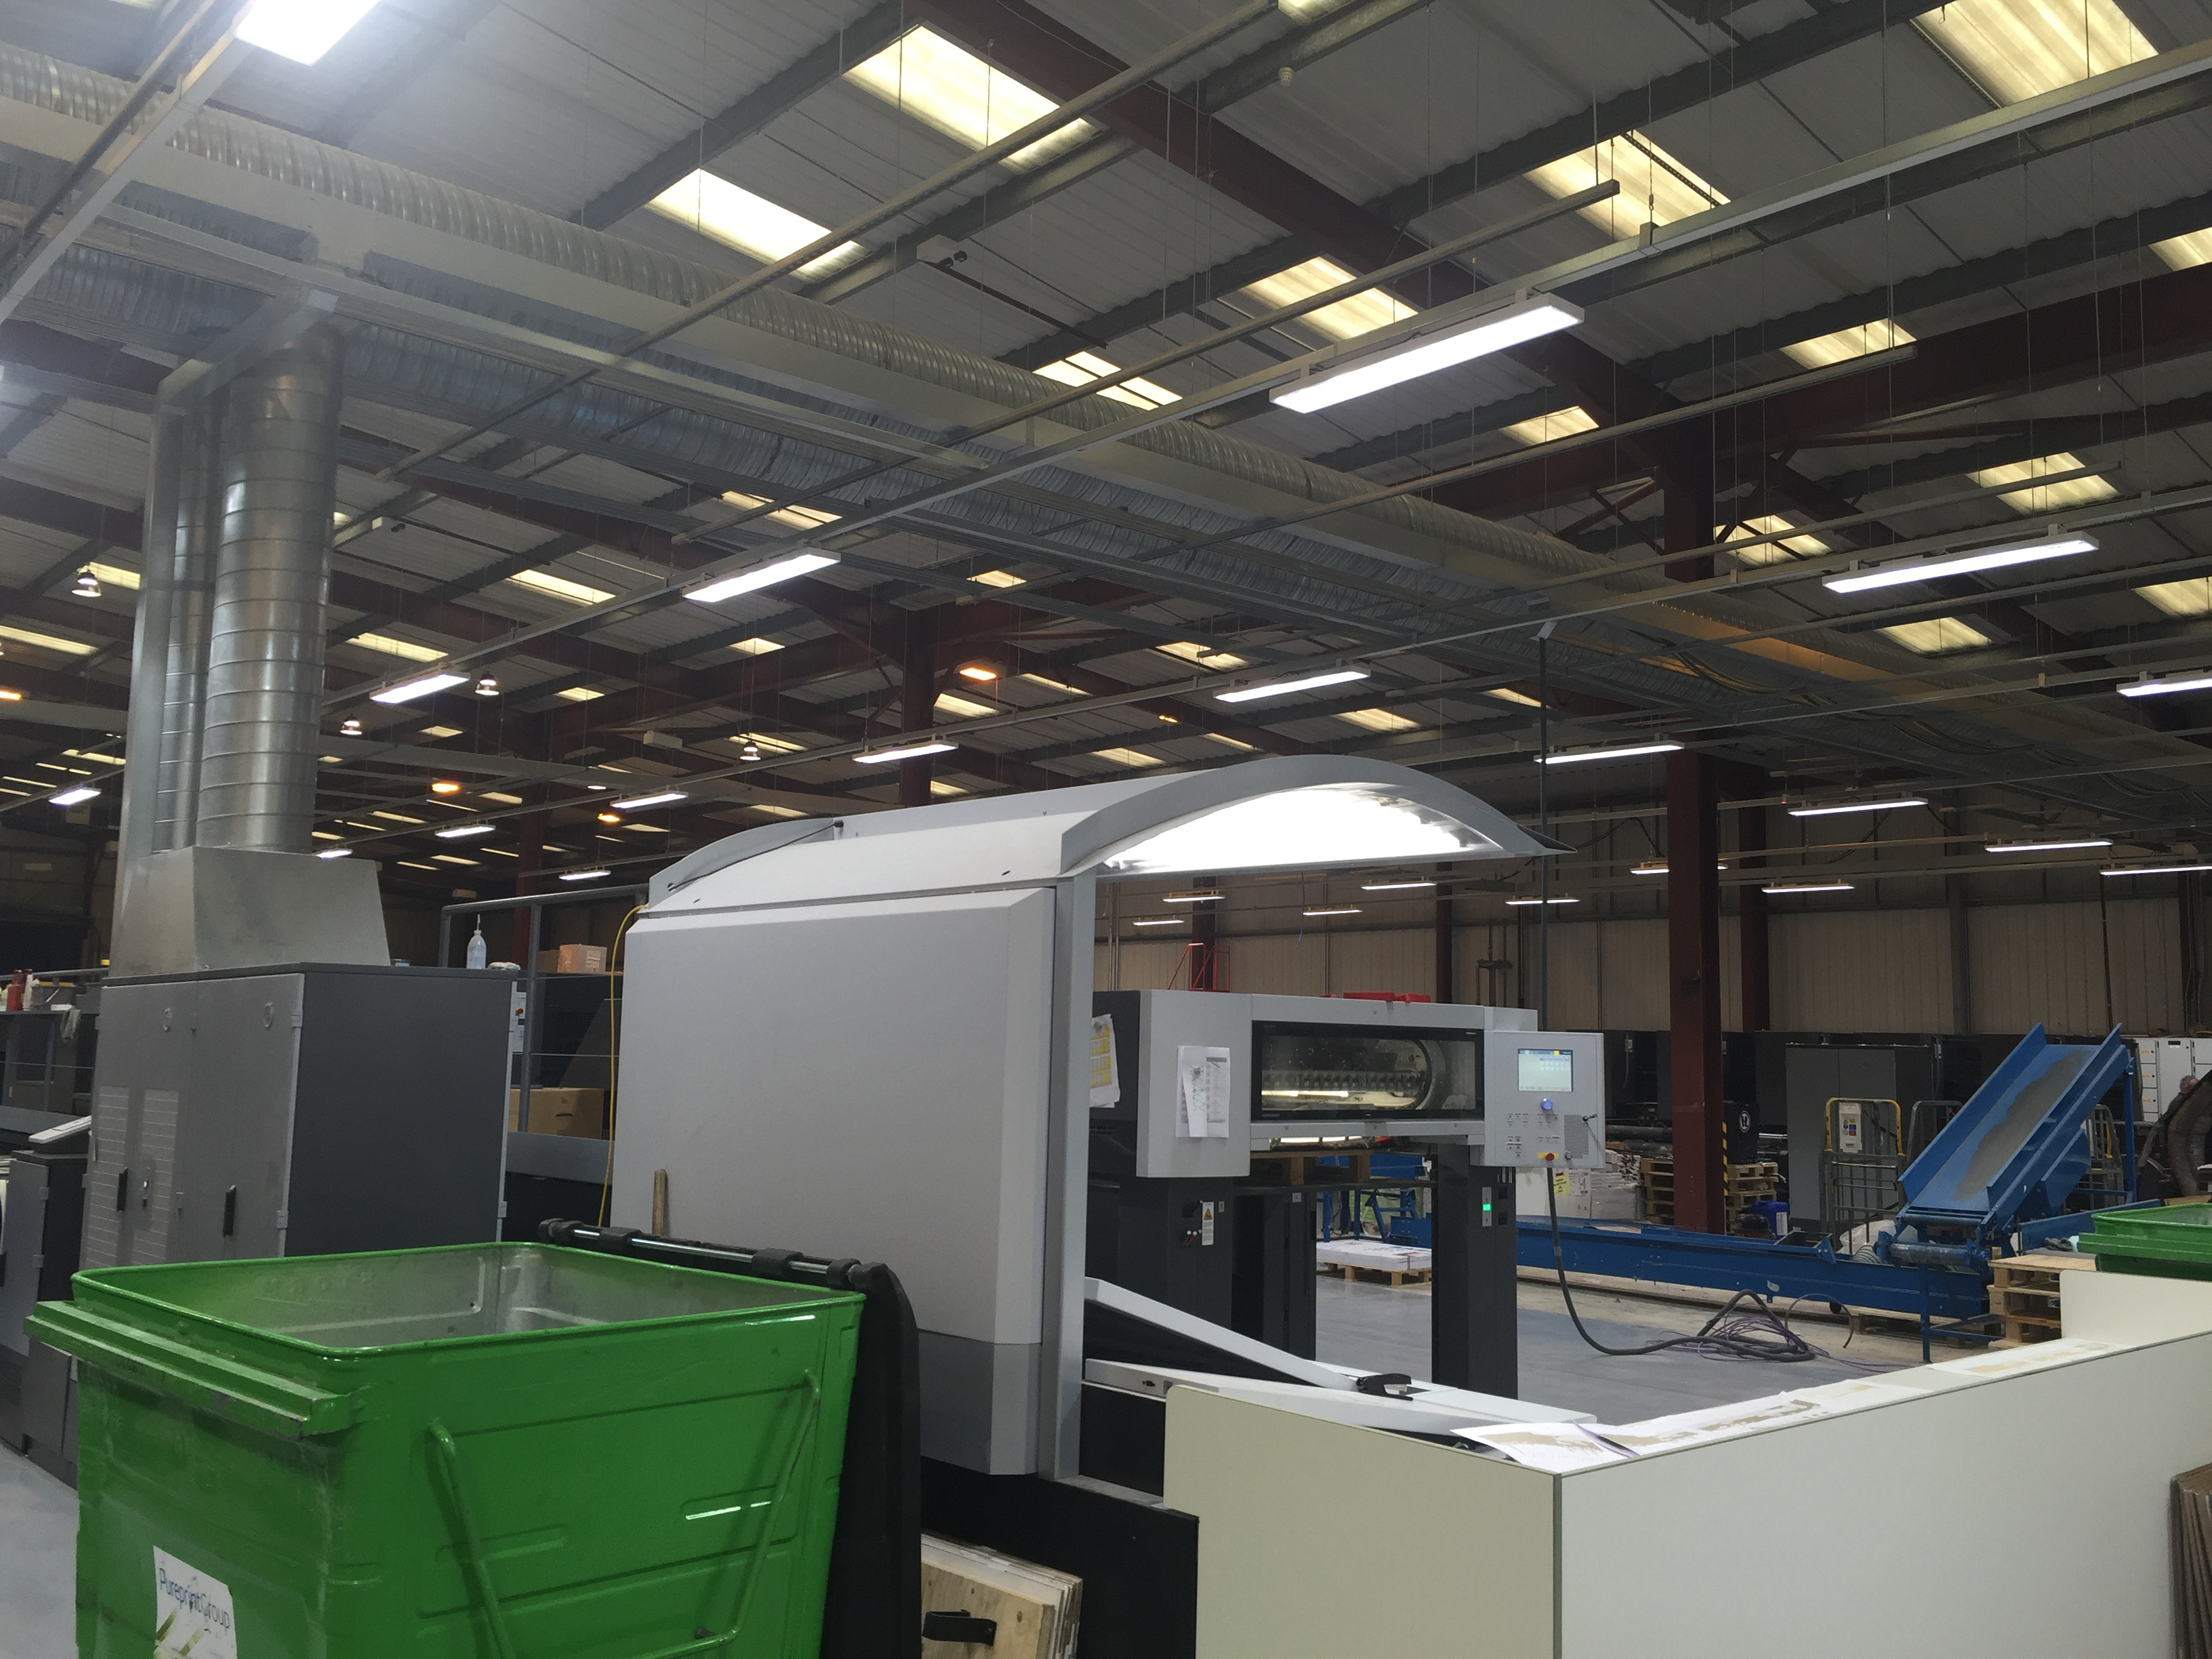 Energy efficient lighting companies lumilow yorkshire